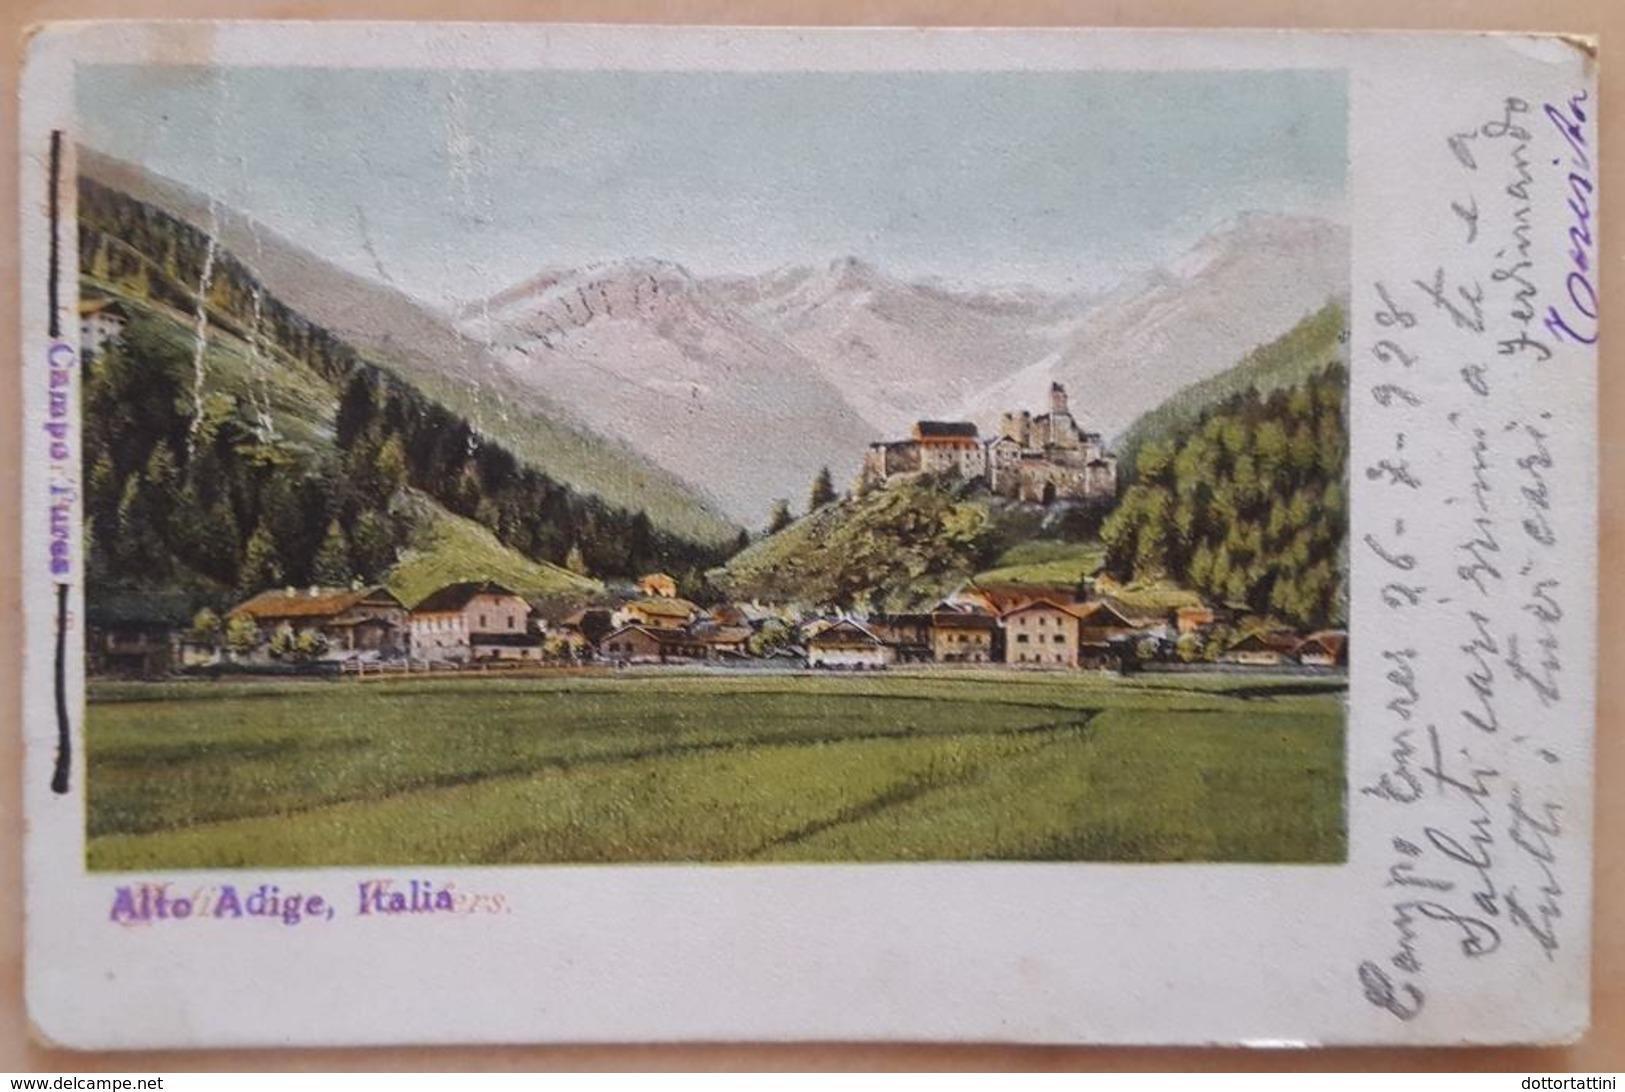 CAMPO TURES - BOLZANO - Italiano Sovrascritto Su Tedesco - 1928 - Bolzano